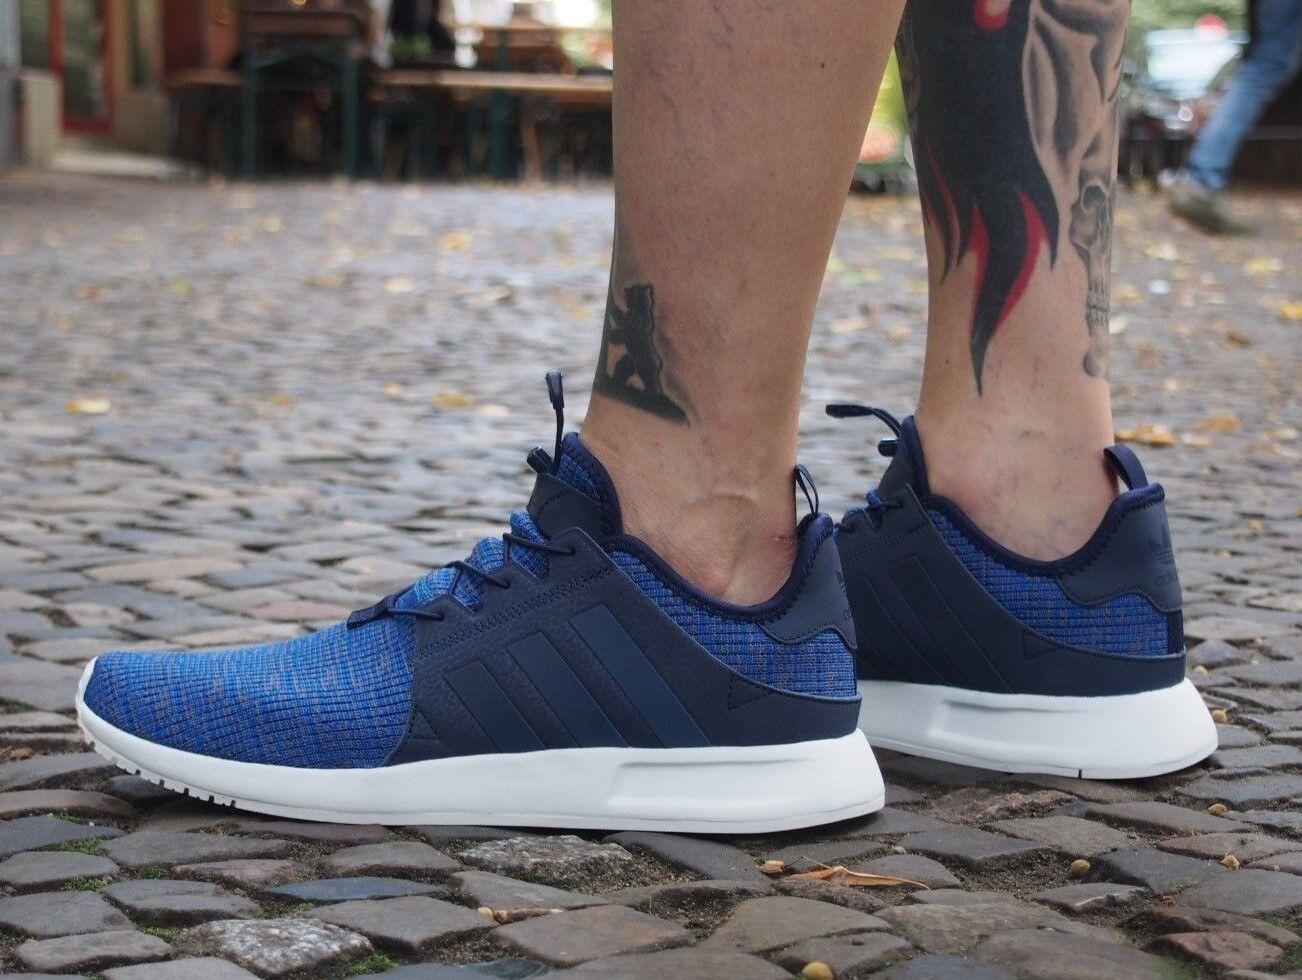 adidas Originals Schuh BB2900 X_PLR blau explorer blue Turnschuh NMD NEU SALE